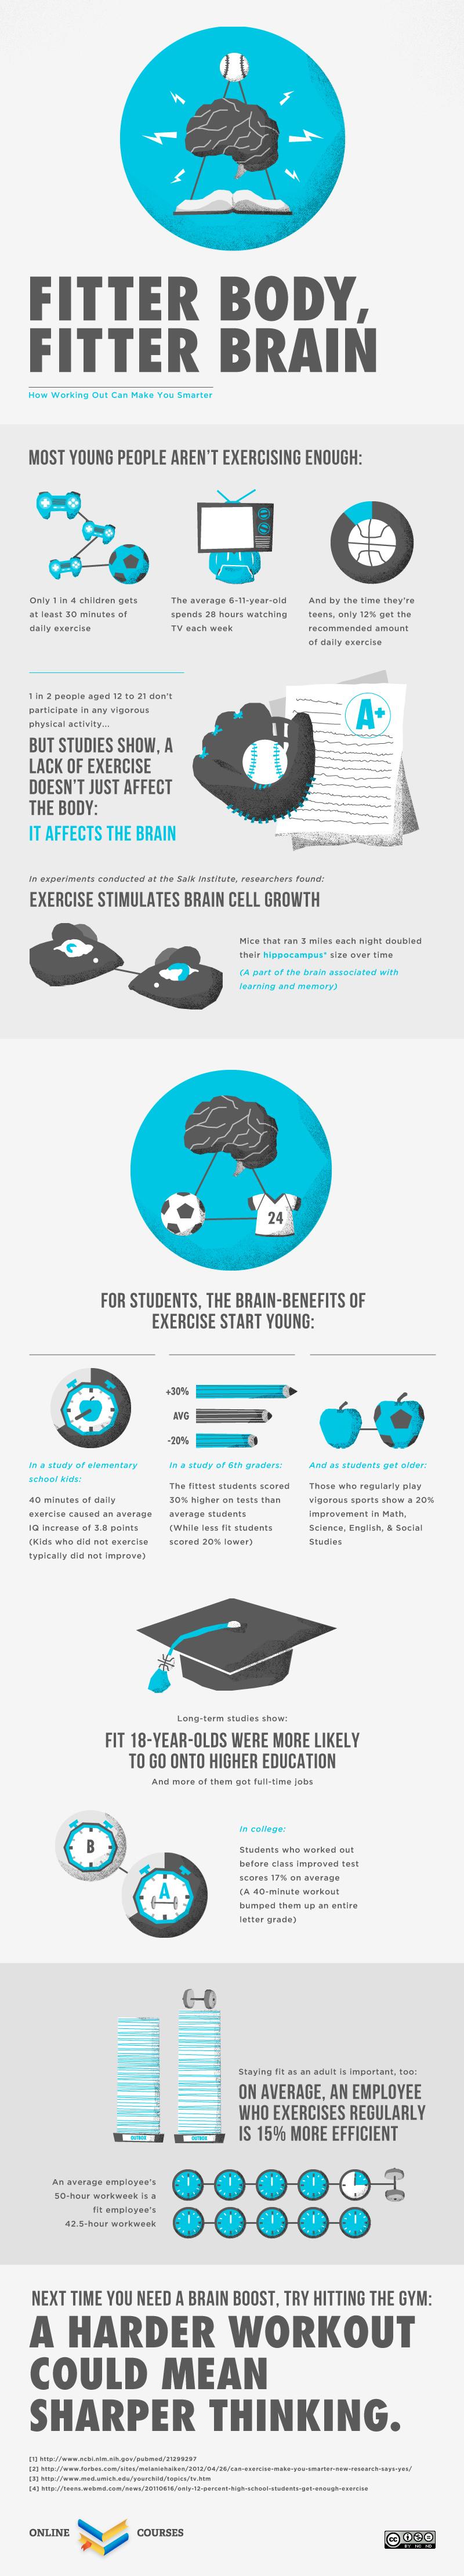 Fitter Body, Fitter Brain - Exercise Infographic